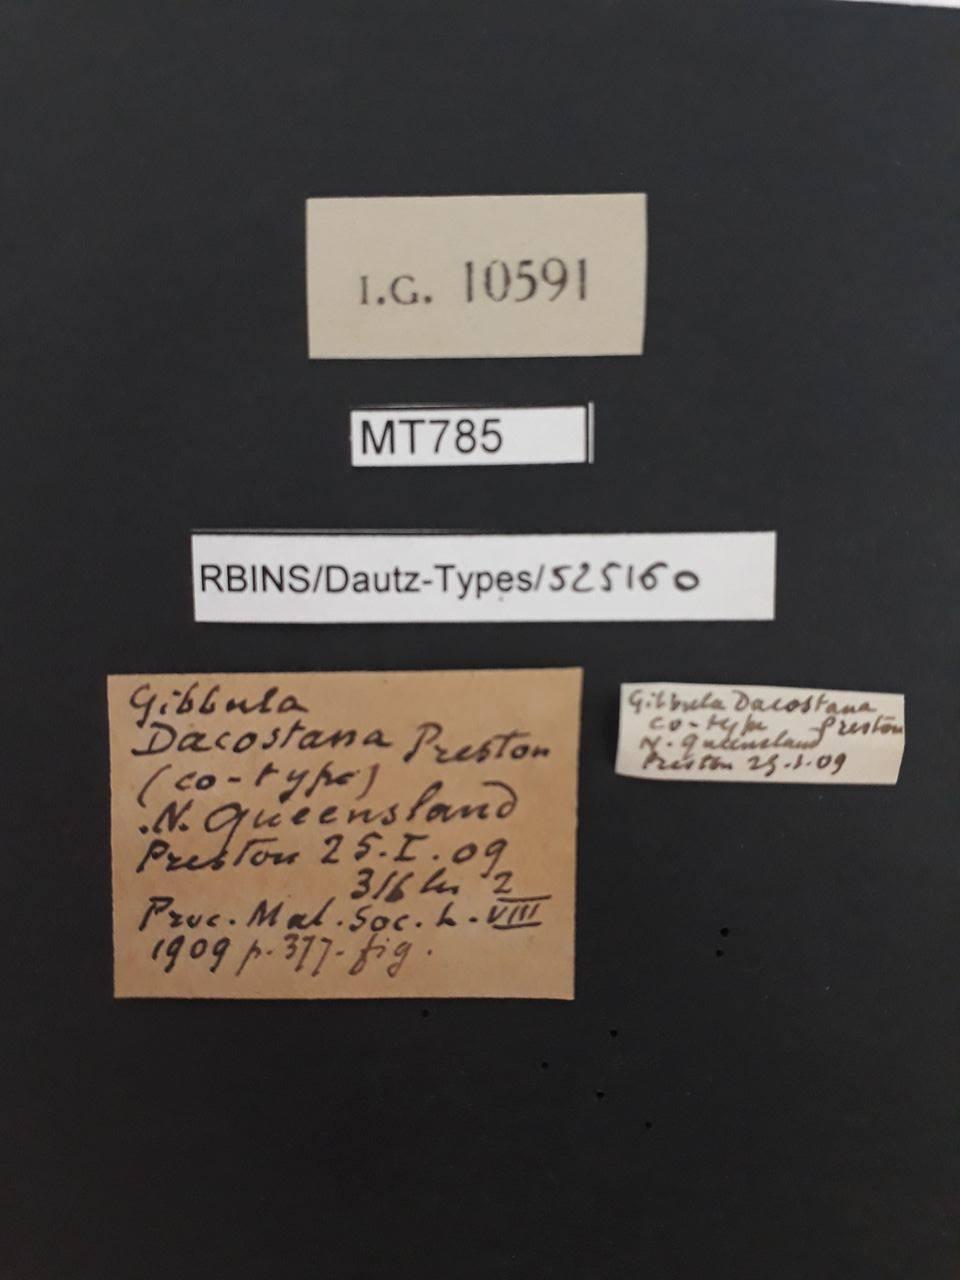 BE-RBINS-INV MT 785 Gibbula dacostana pt Lb.jpg